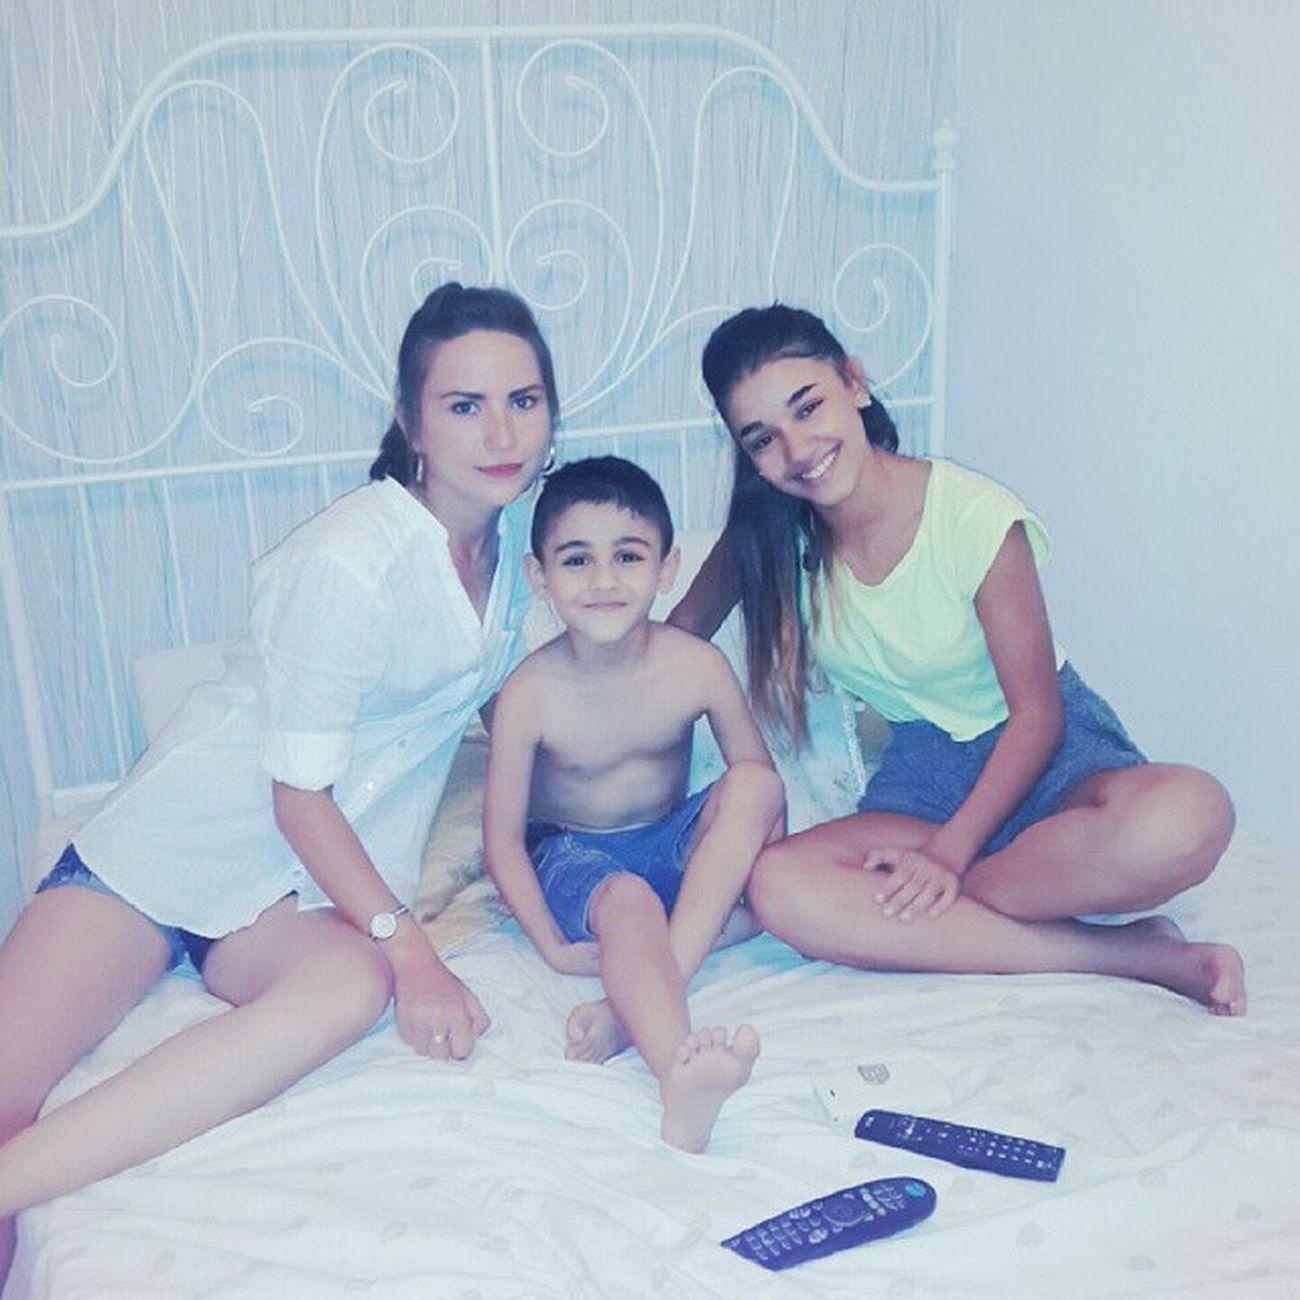 Kids Pretty Cute Russiangirlsss_ iloveisrael israel עם הילדים הכי יפים בעולם❤